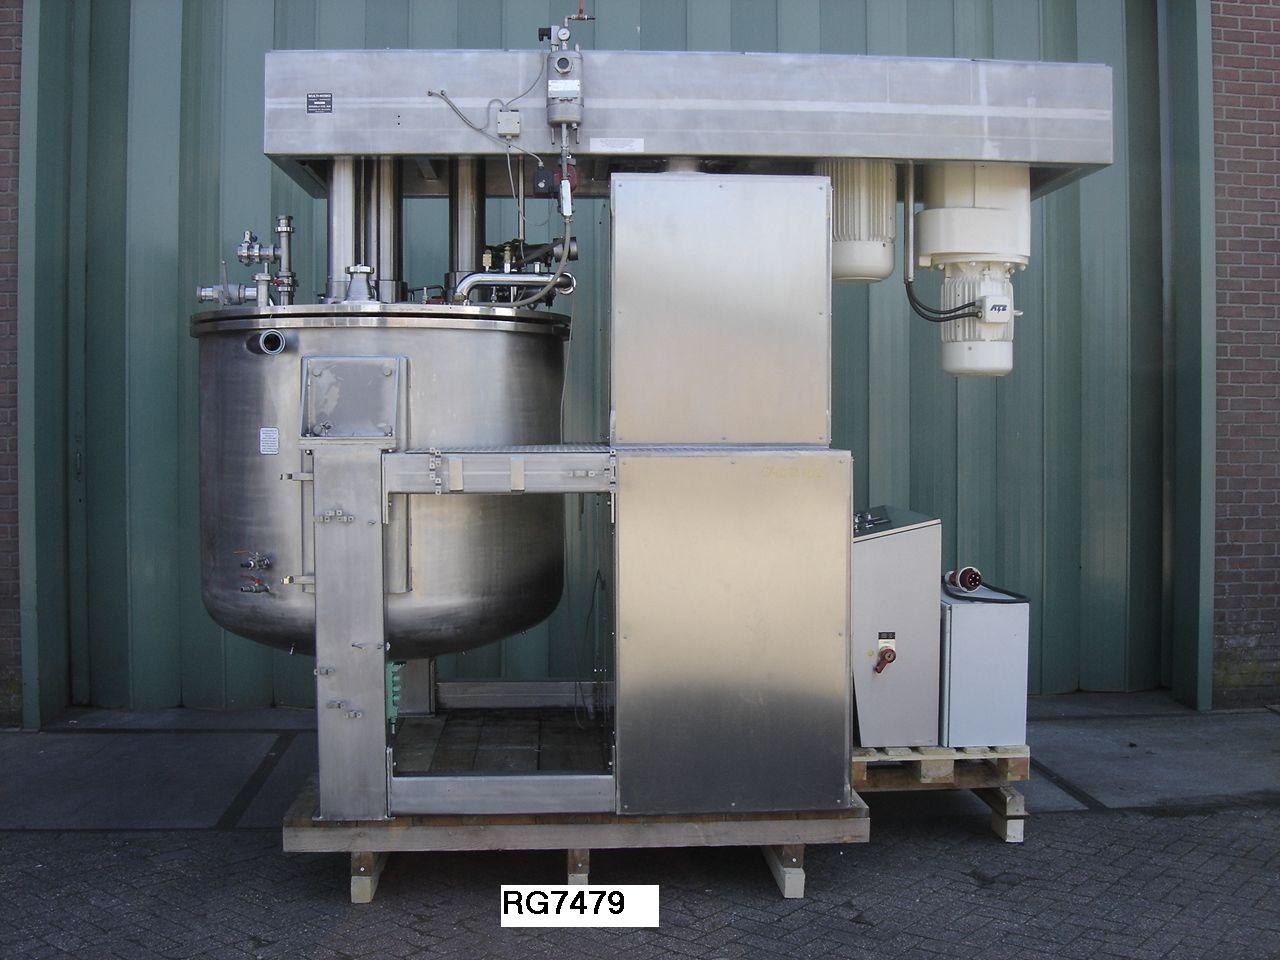 528 Gallon 21 HP Brogli 304 Stainless Steel Multi-homo Vacuum Processing Vessel Reconditioned